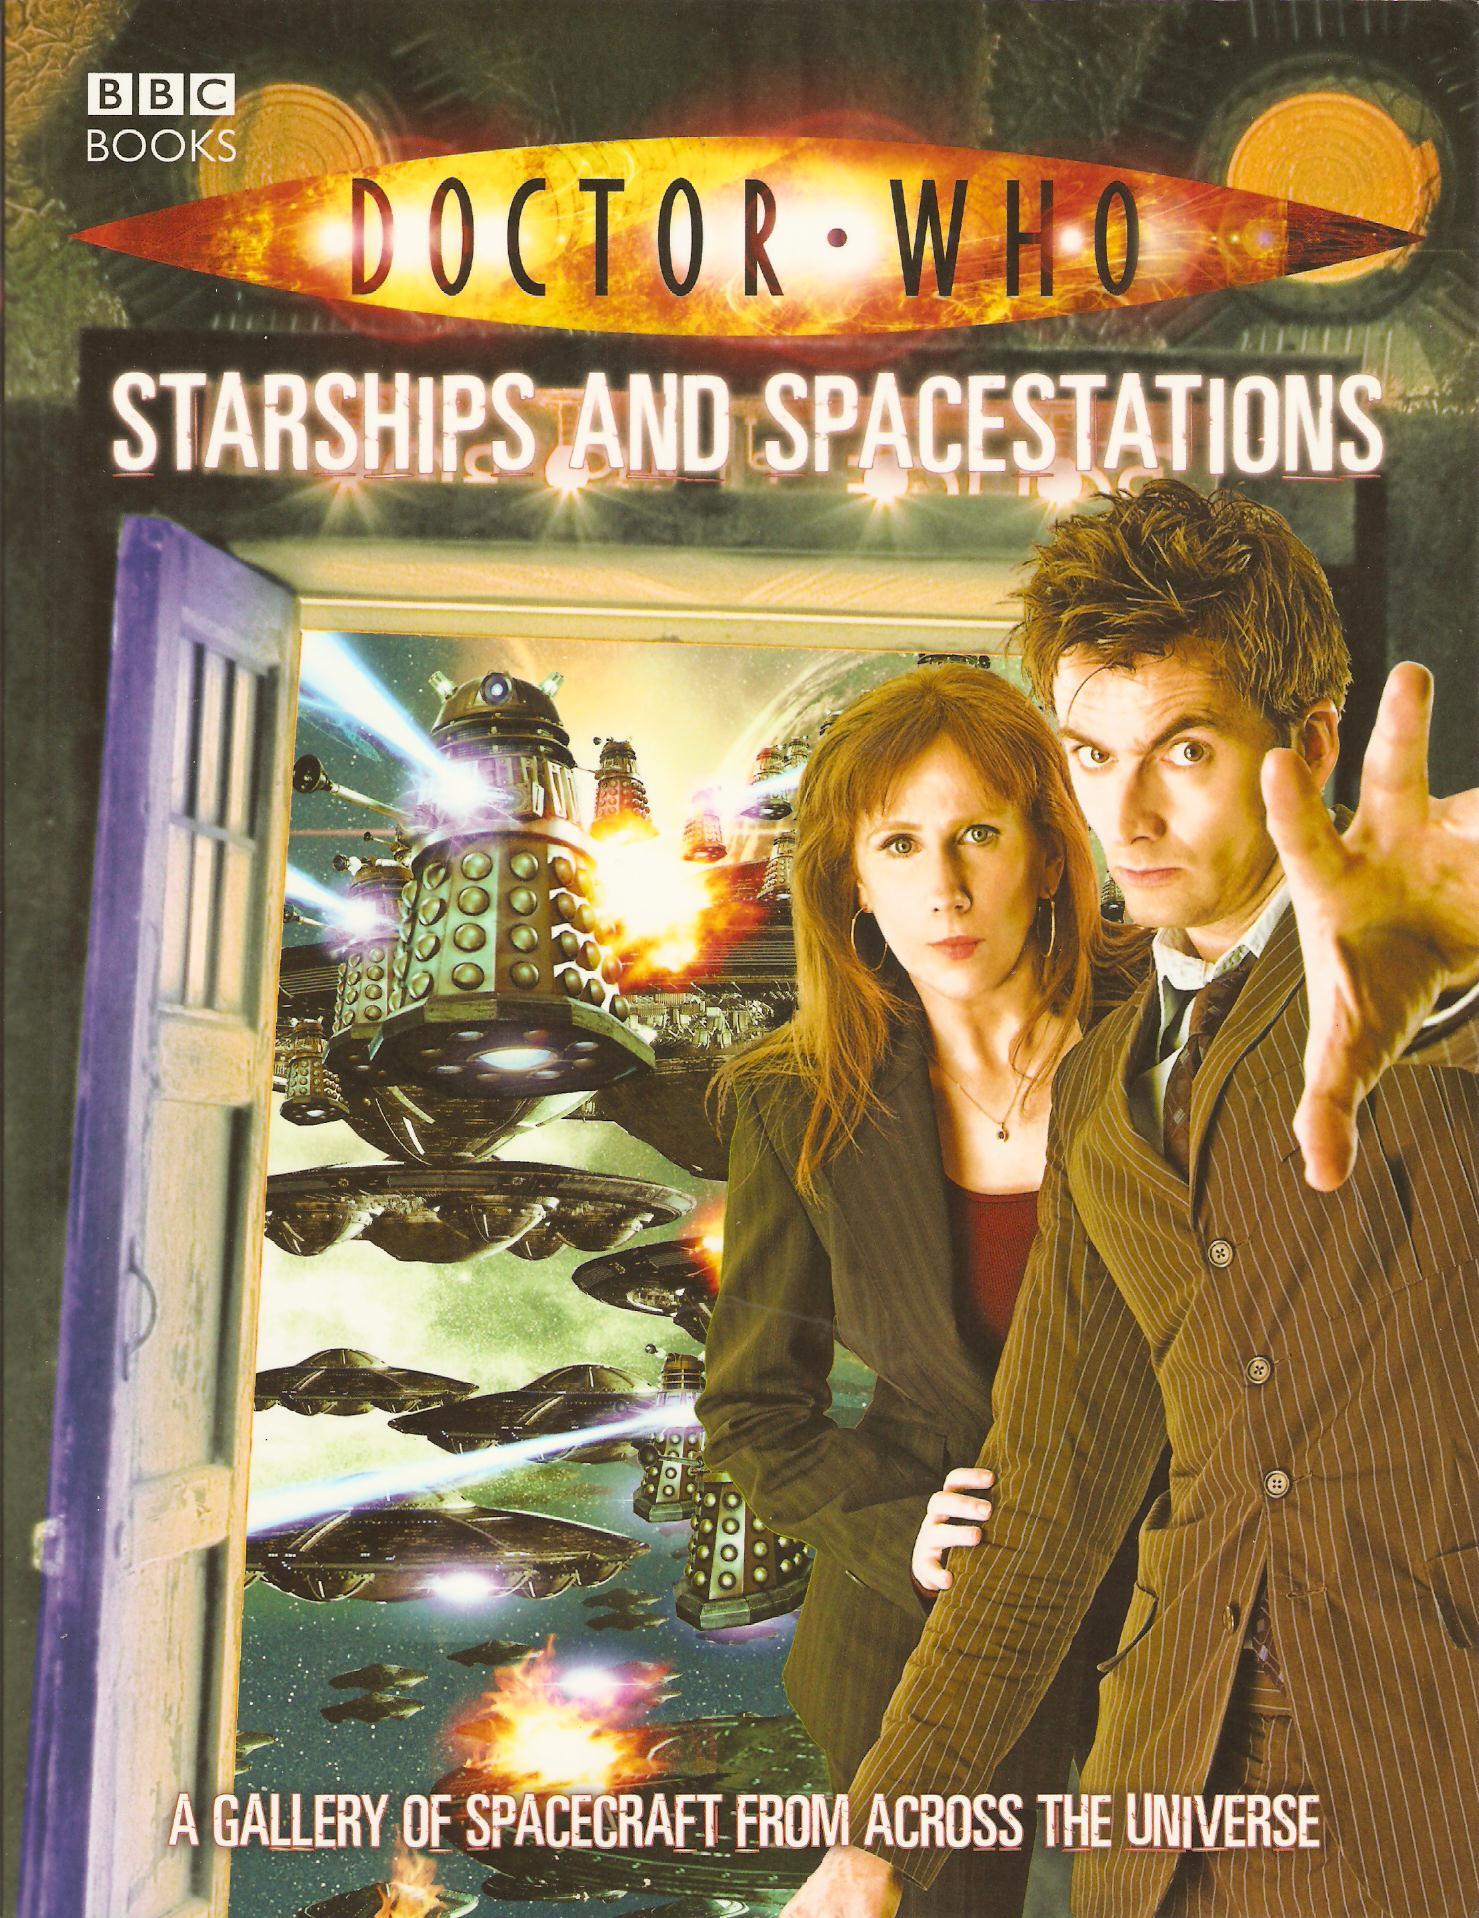 StarshipsandSpacestations